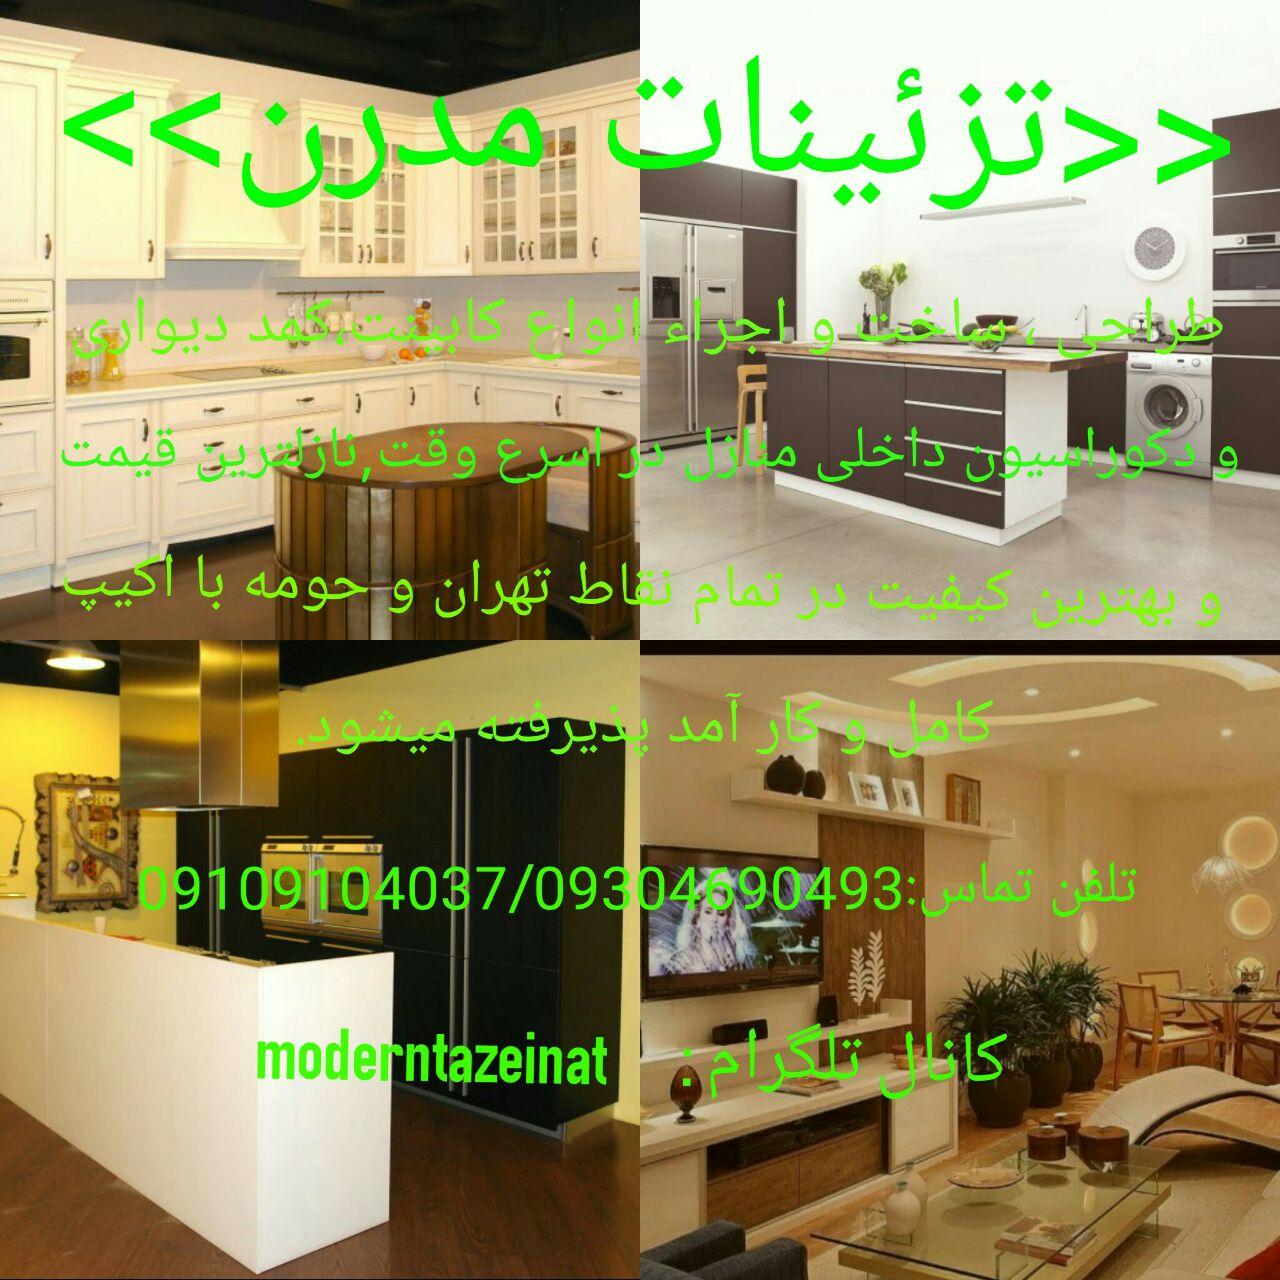 446734746_335004